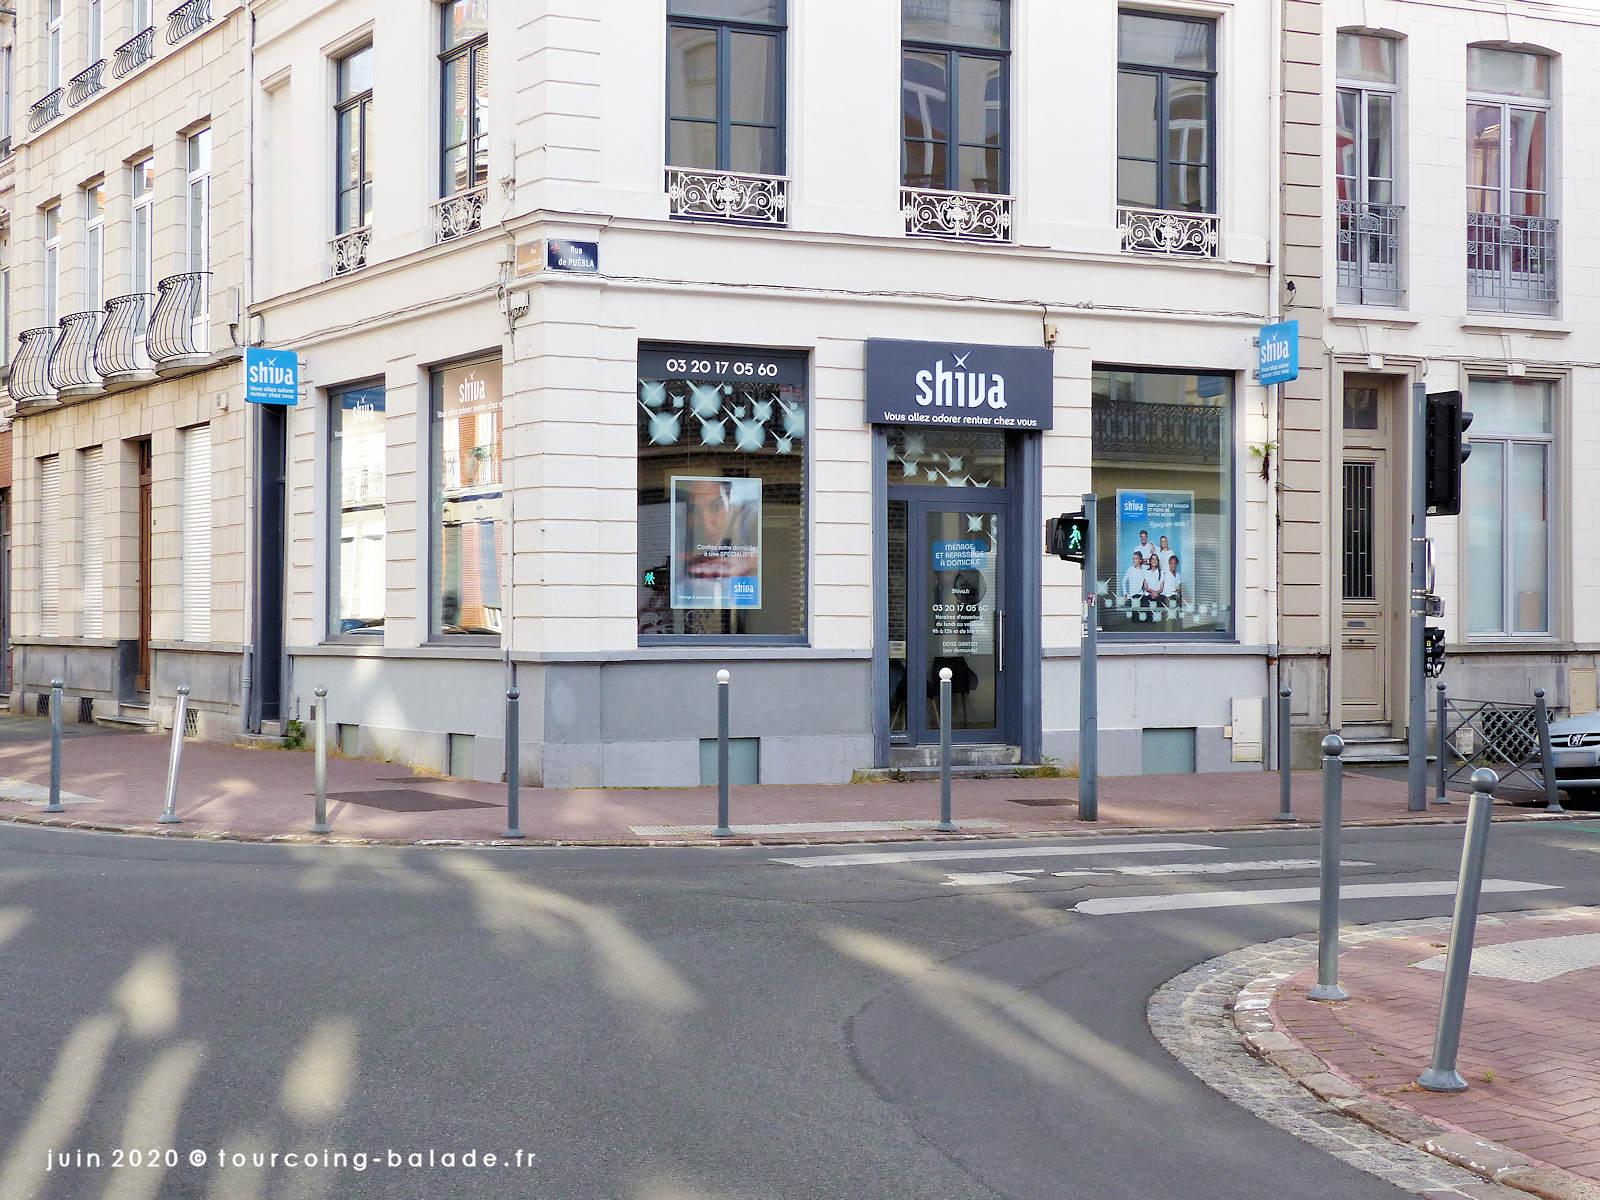 Shiva Lille, rue du Puébla, 2019